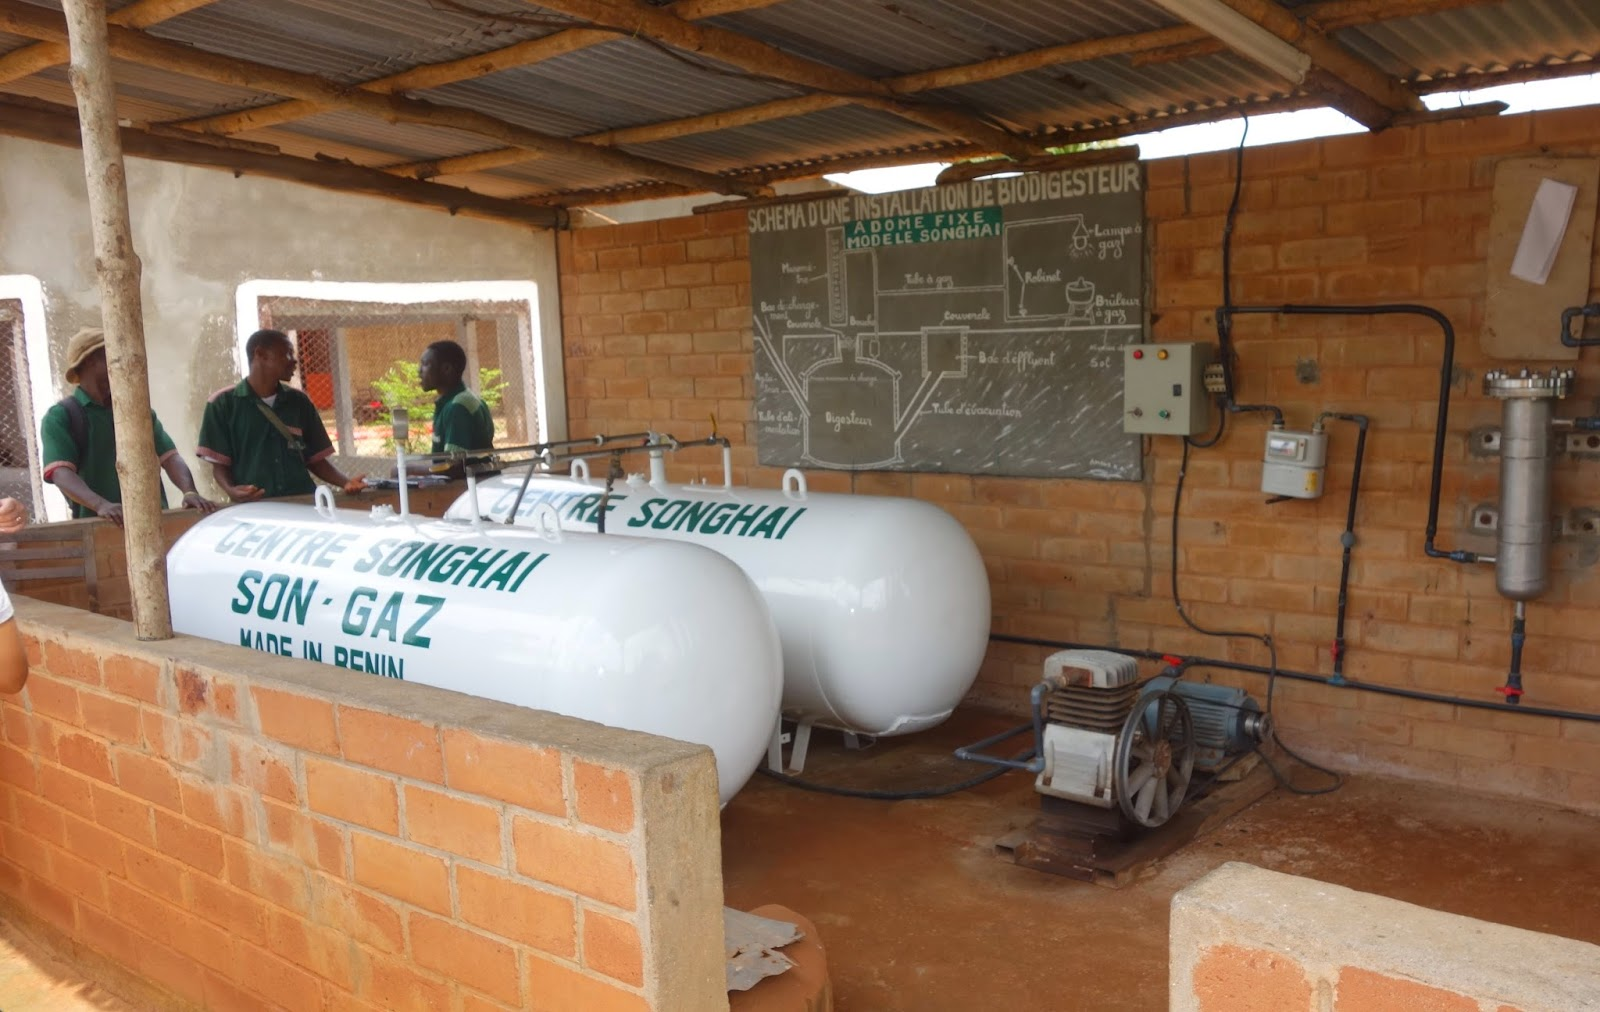 Bein In Benin Songhai Center Porto Novo